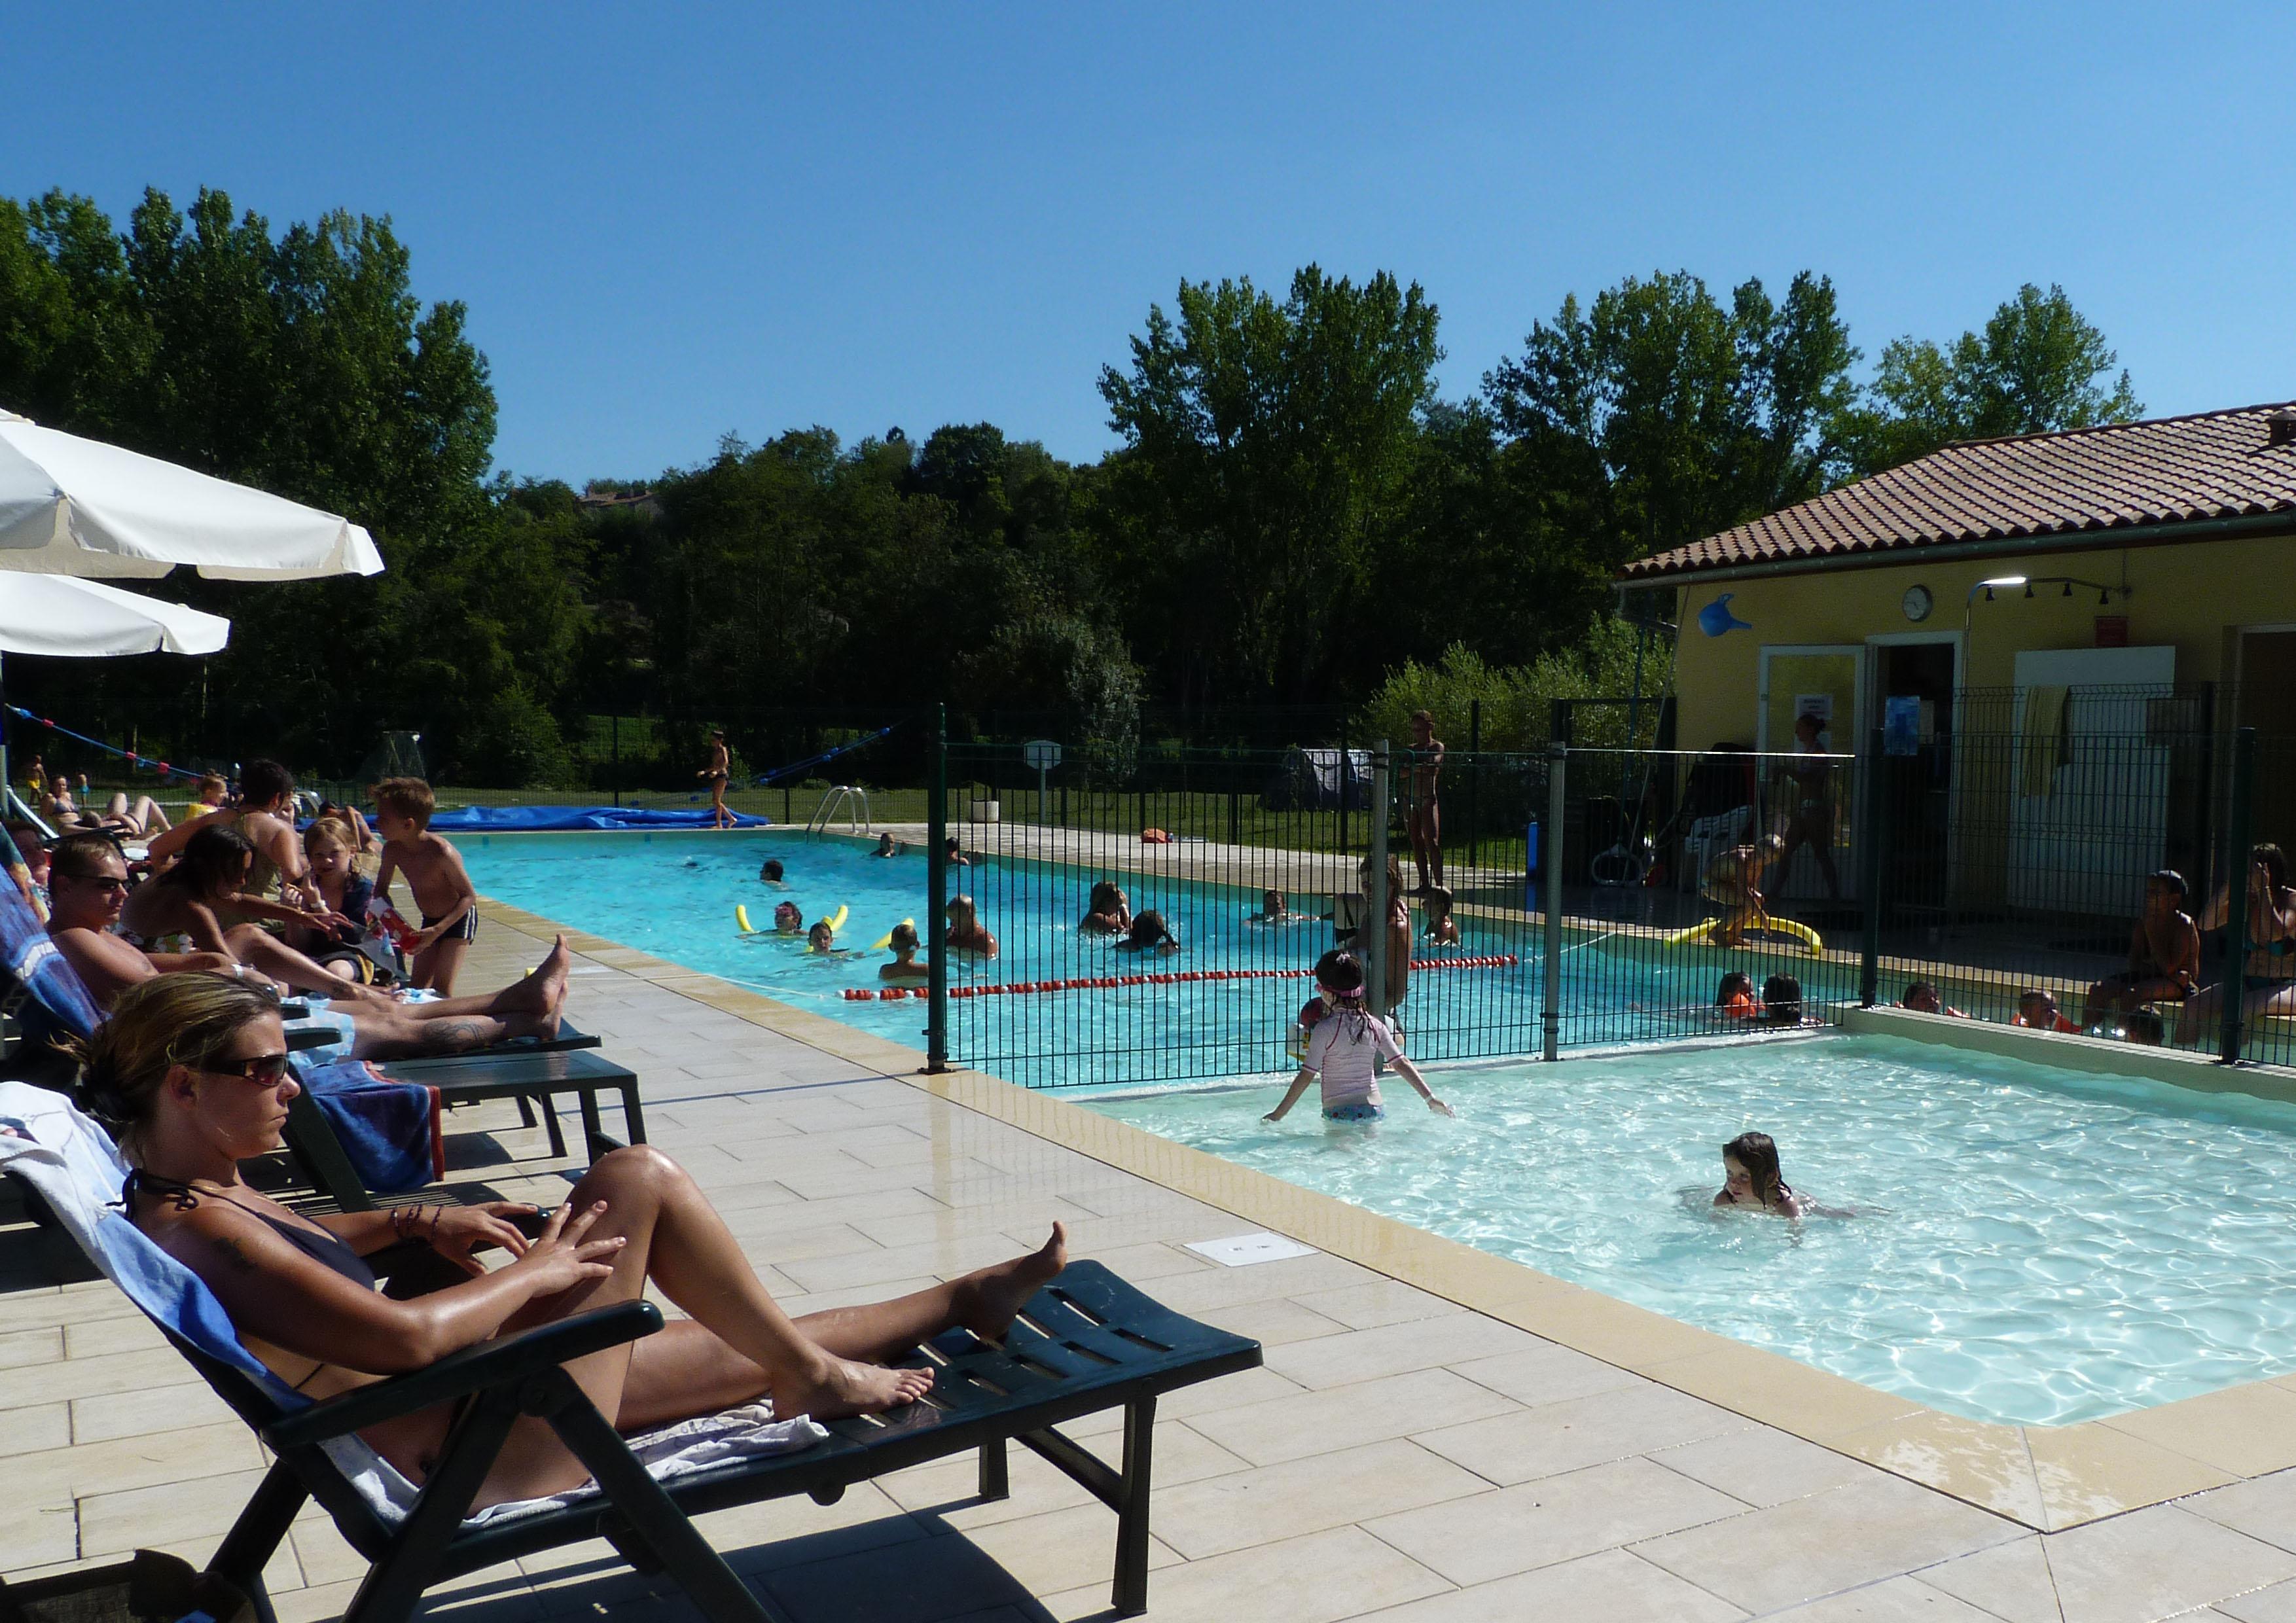 Municipal Camping la Dordogne Verte, Saint-Aulaye, Dordogne